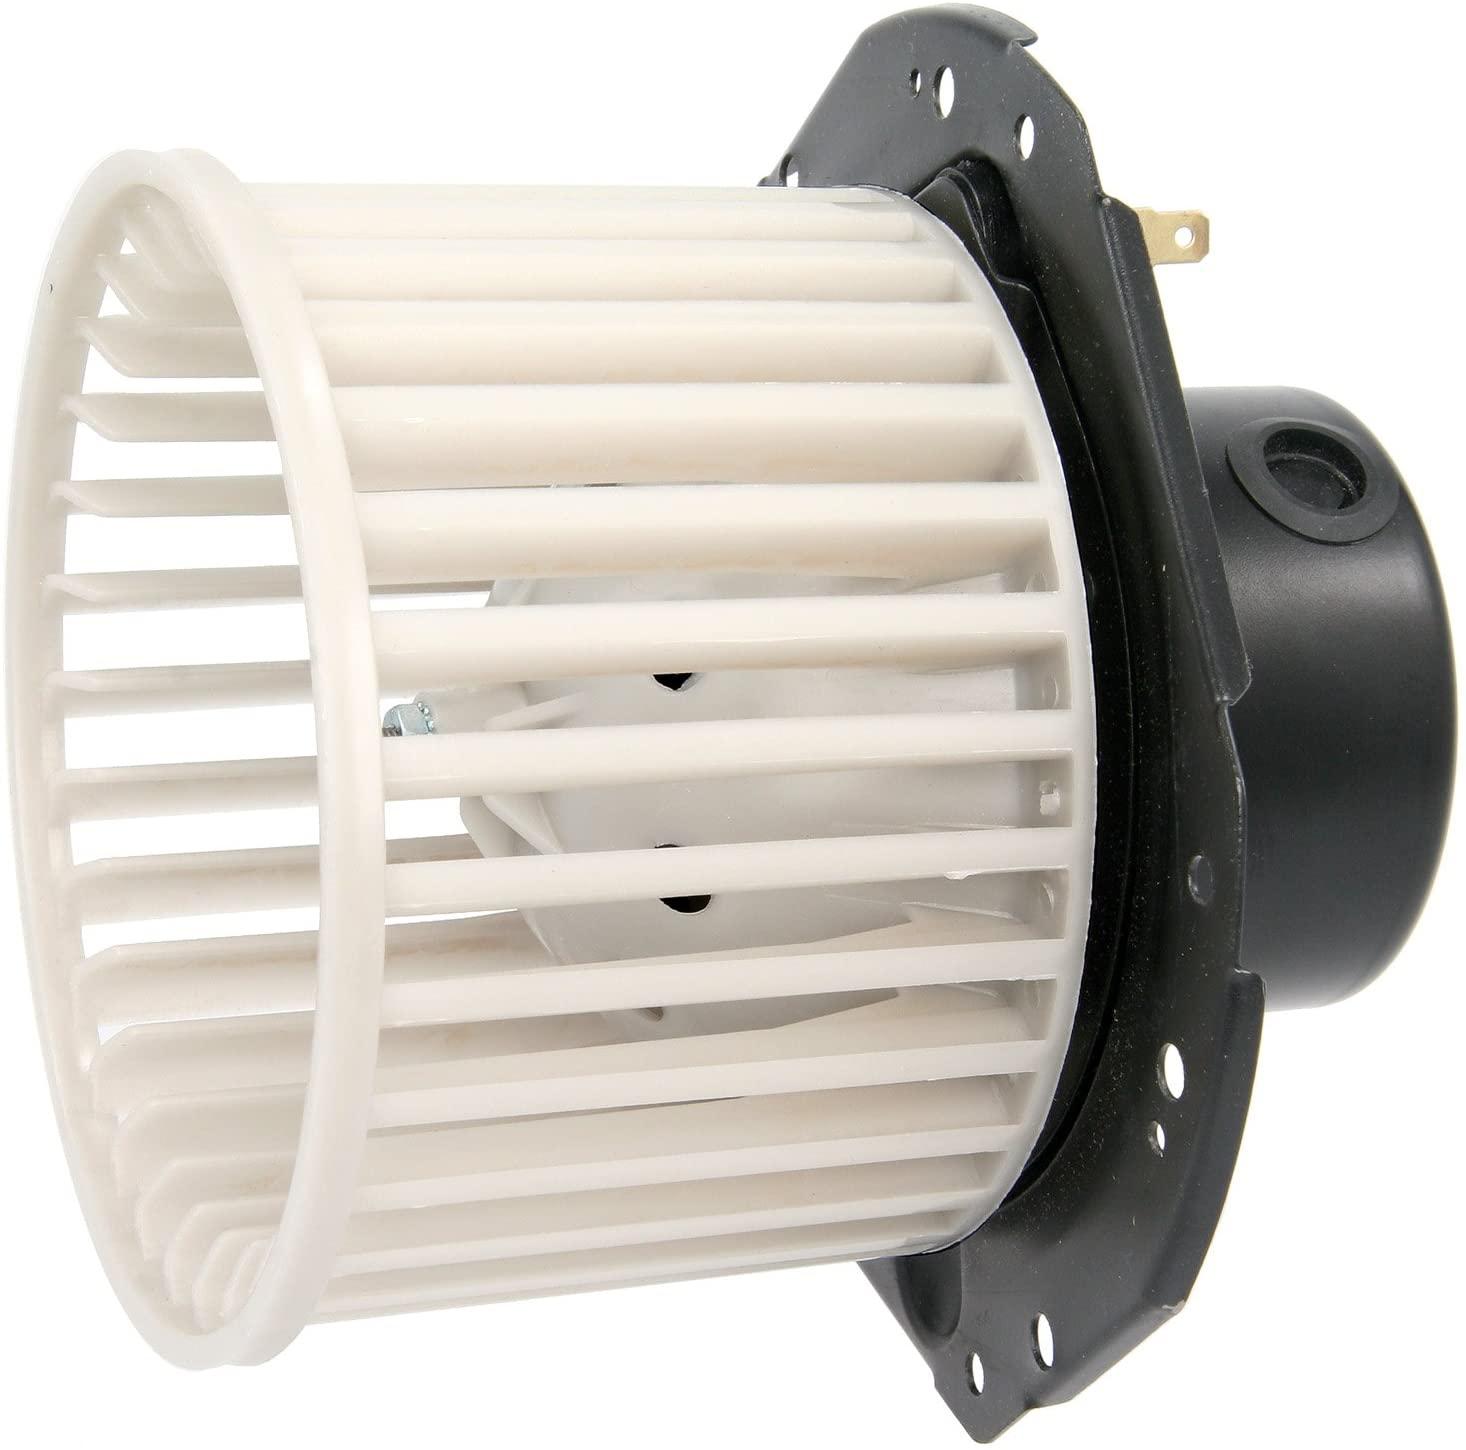 Four Seasons/Trumark 35340 Blower Motor with Wheel